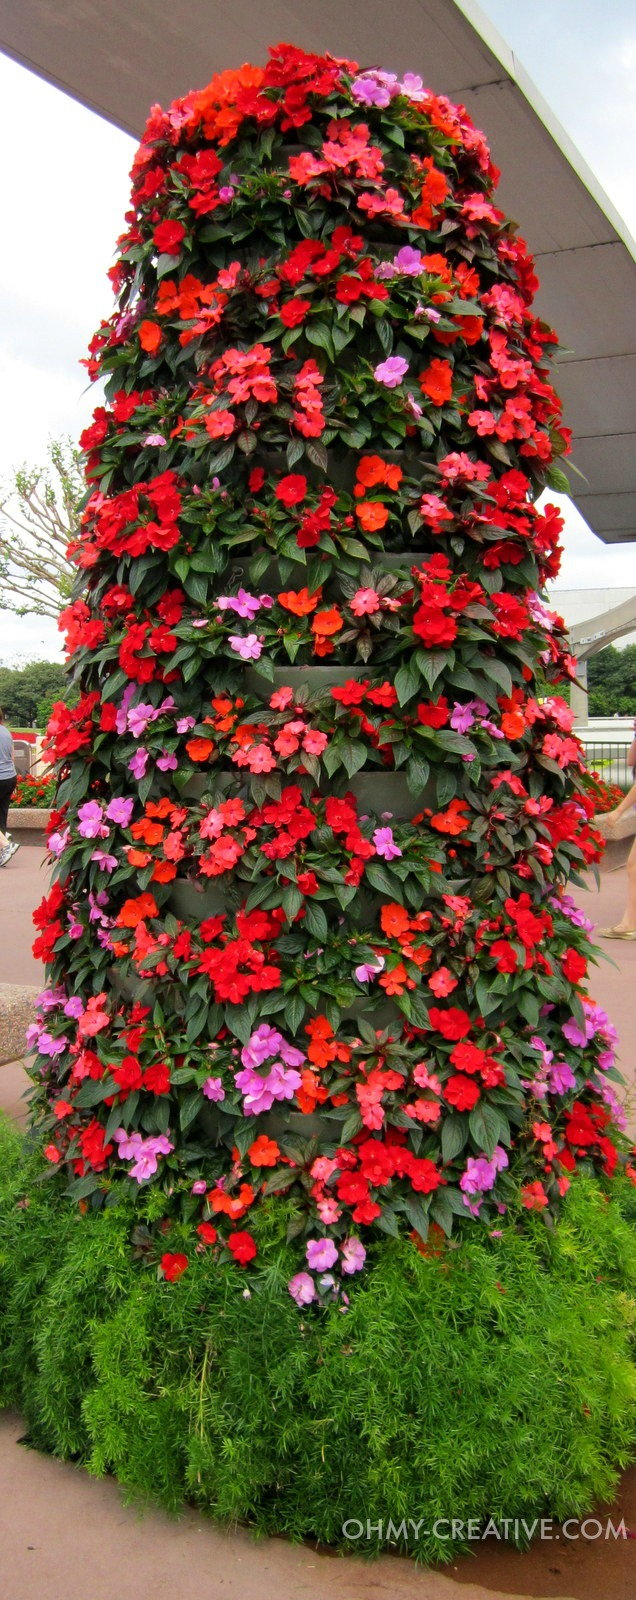 Flower Topiarie Epcot International Flower and Garden Festival   |  OHMY-CREATIVE.COM